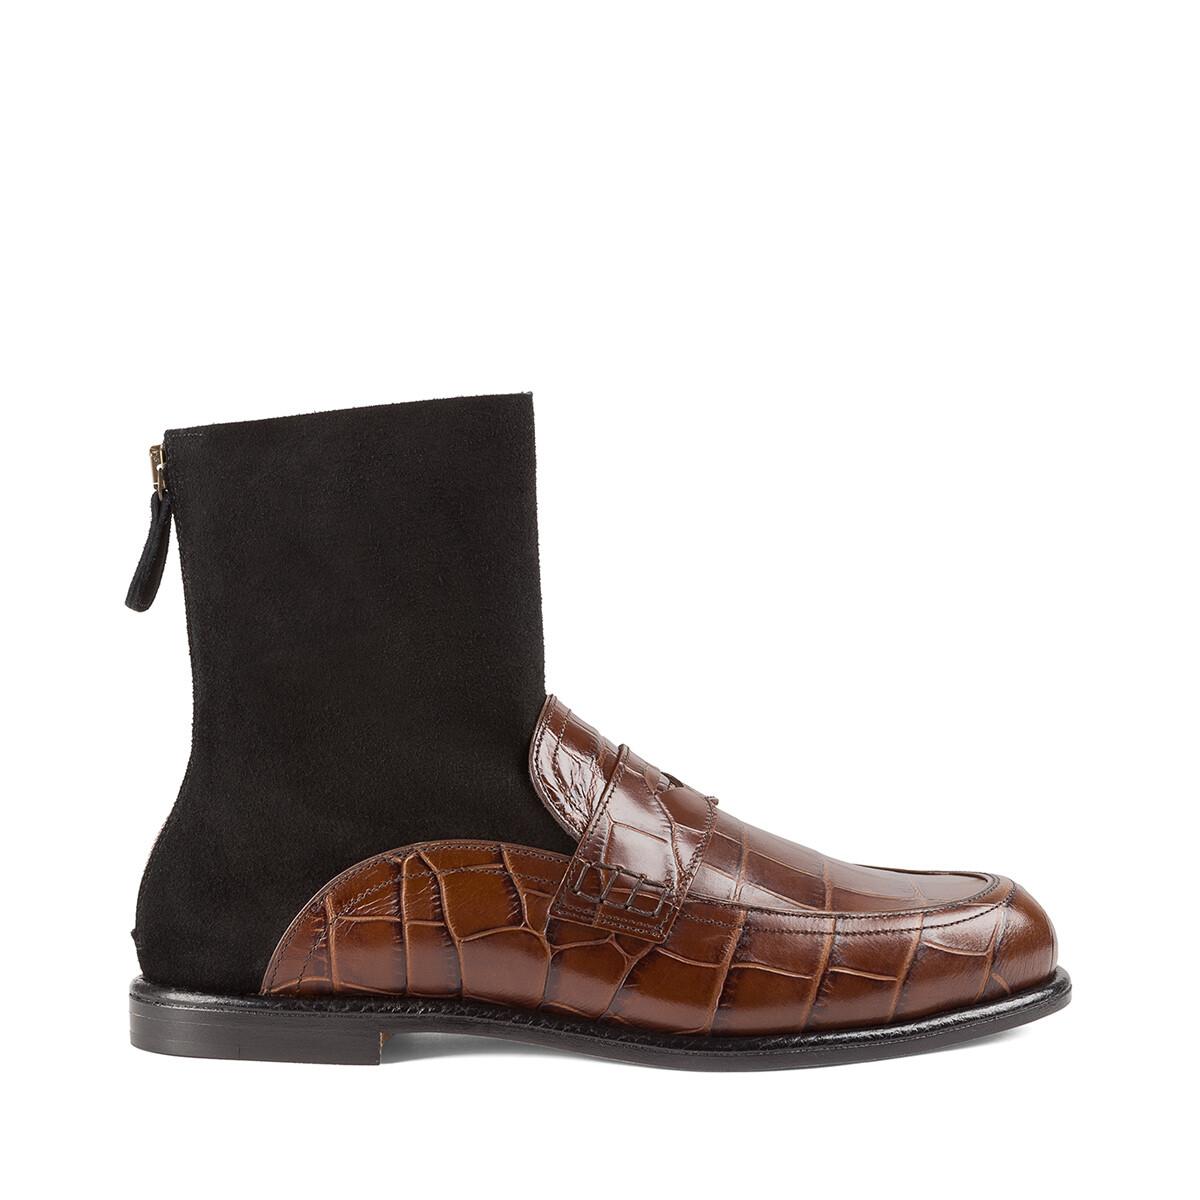 LOEWE Sock Boot Loafer Brown/Black front